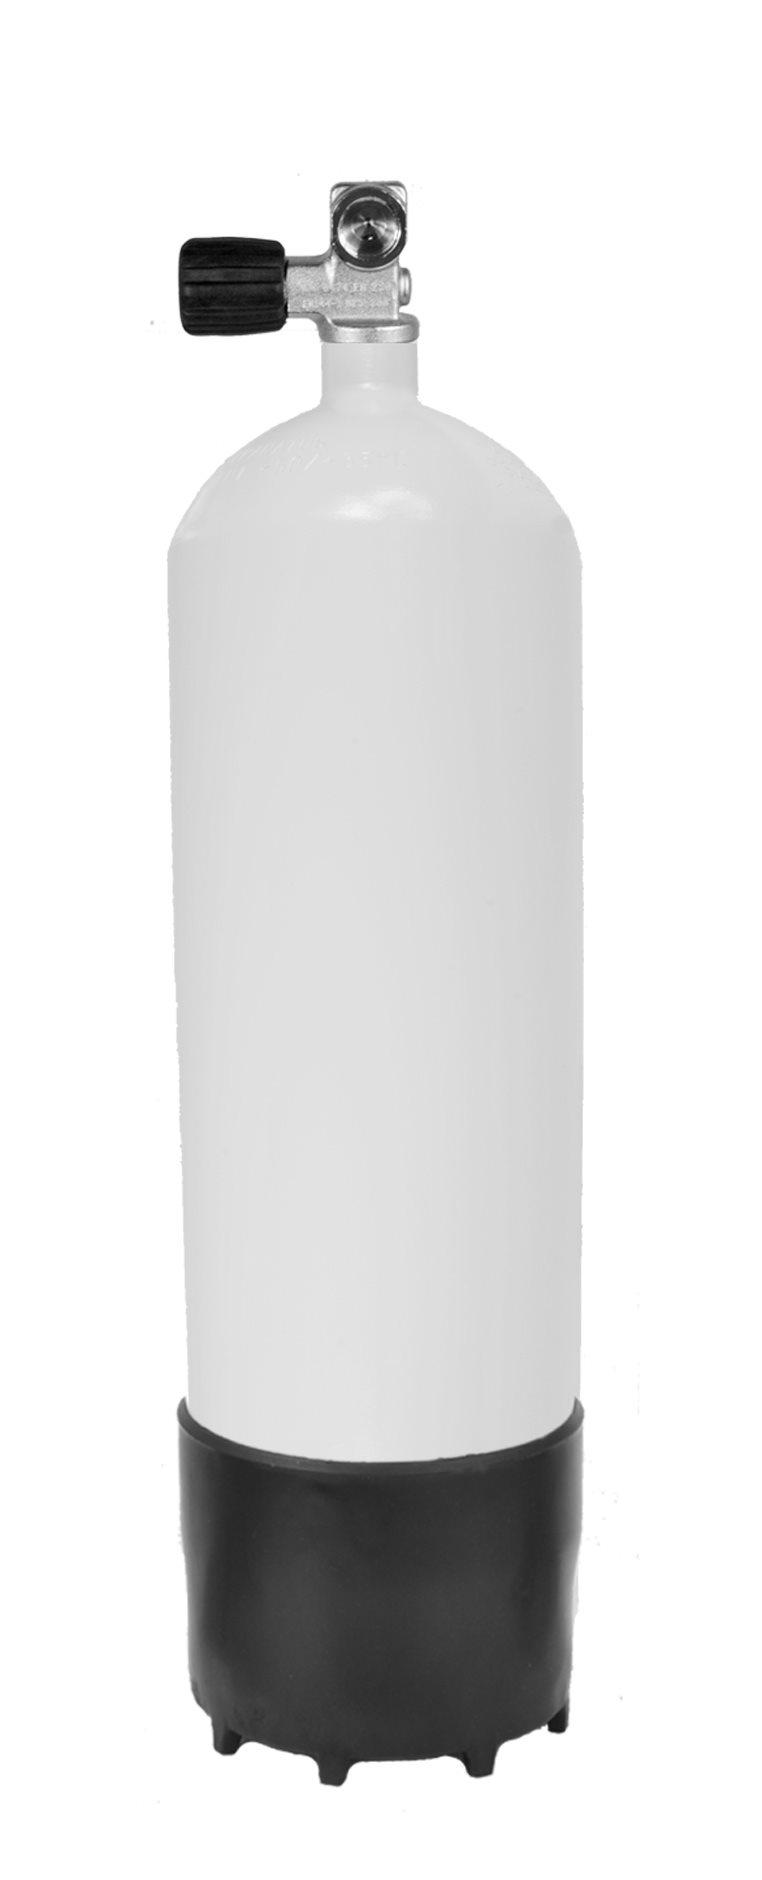 Водолазна бутилка 8,5 л / 232 бара - Eurocylinder